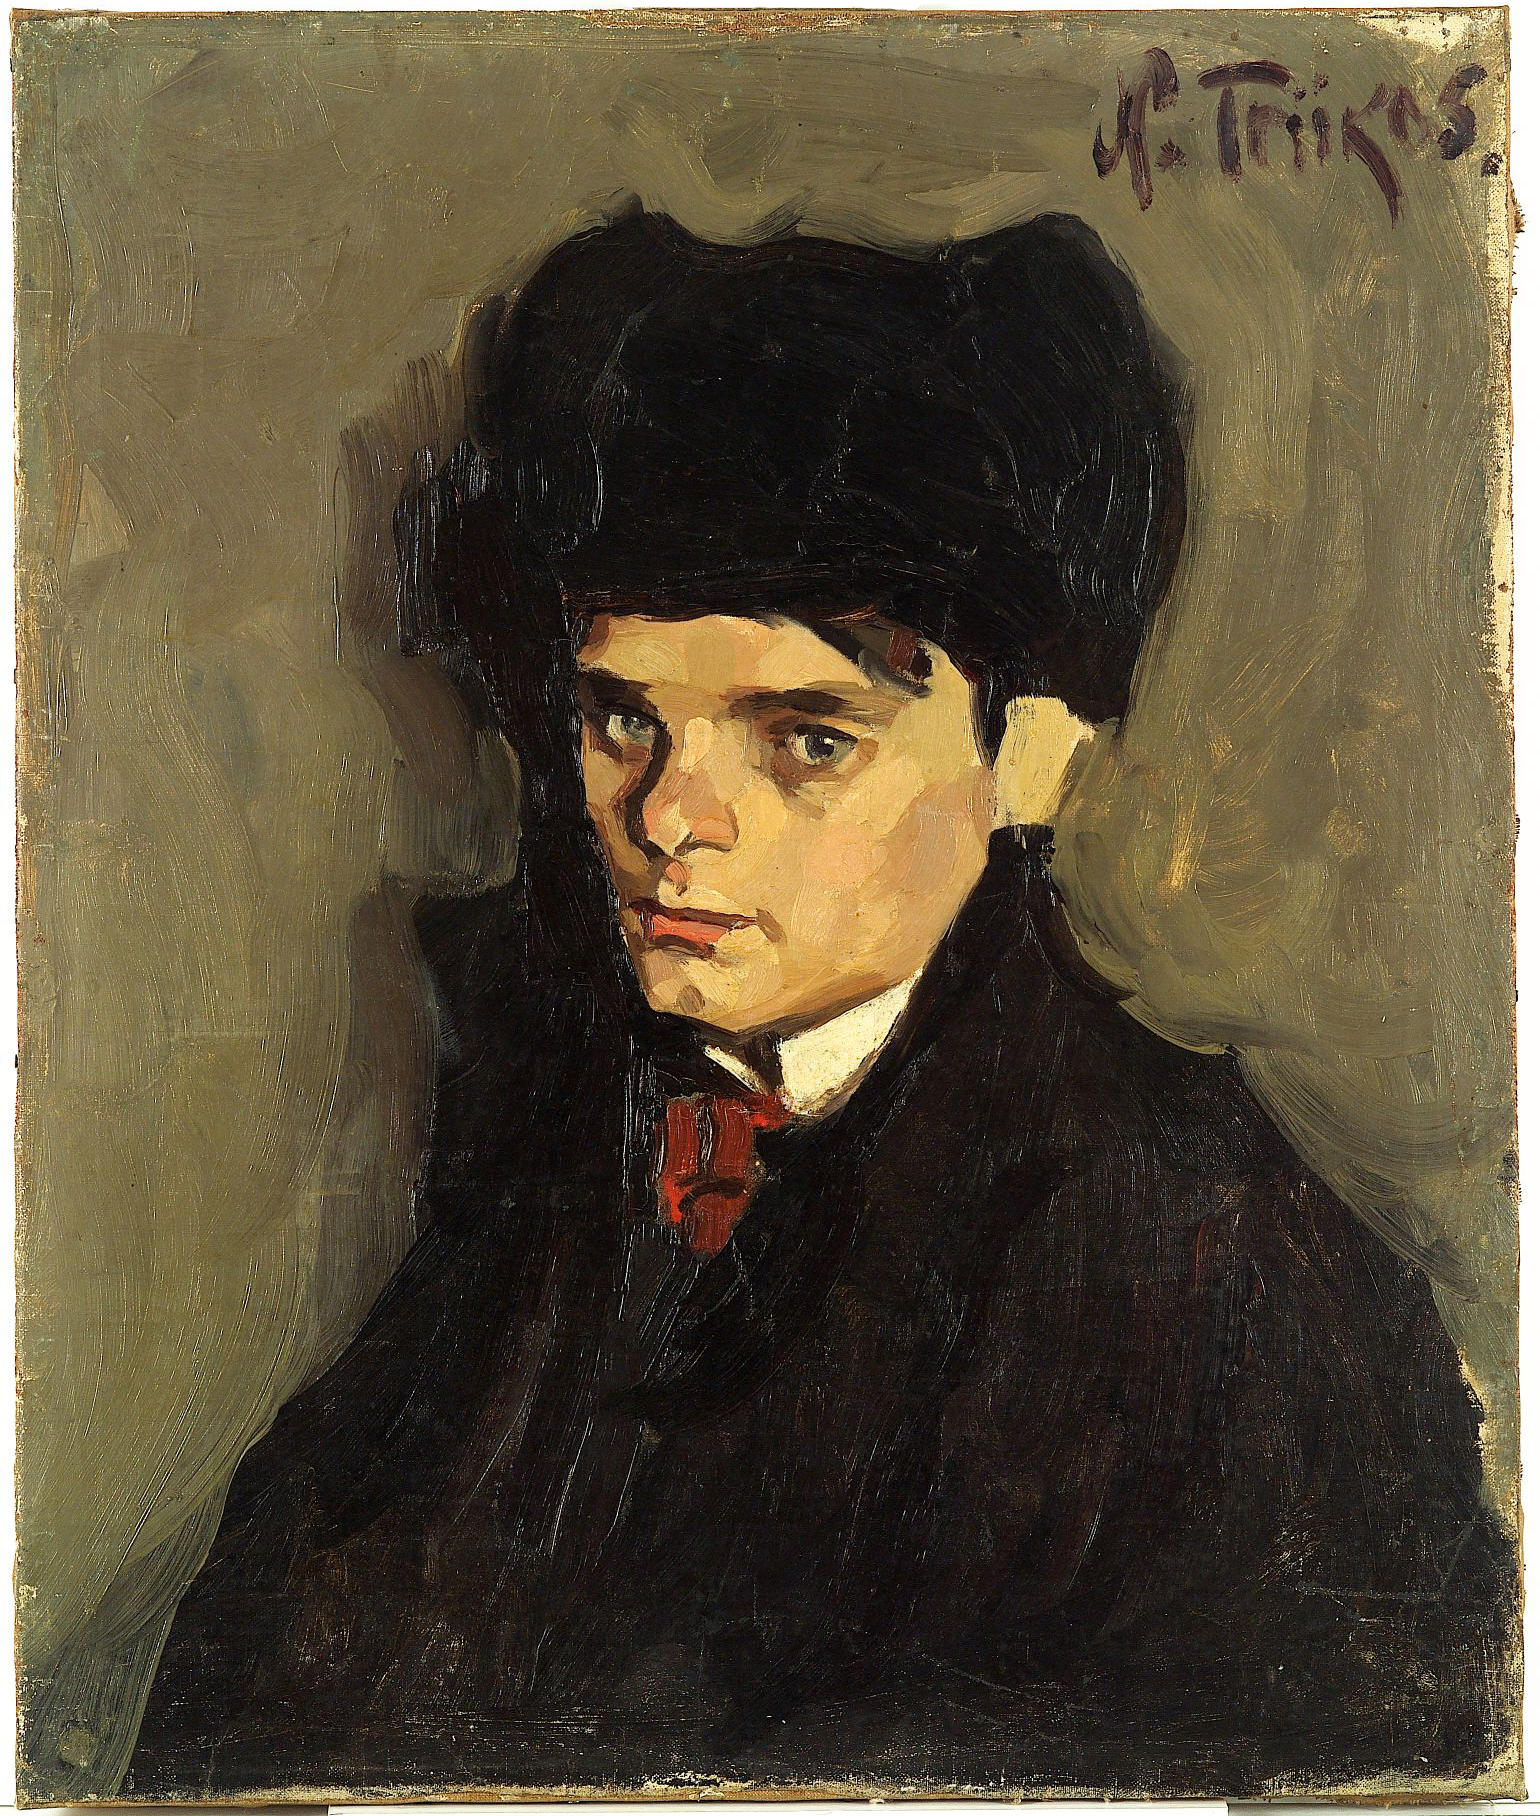 ALEKSANDER TASSA PORTREE | 1915 | ÕLI LÕUENDIL